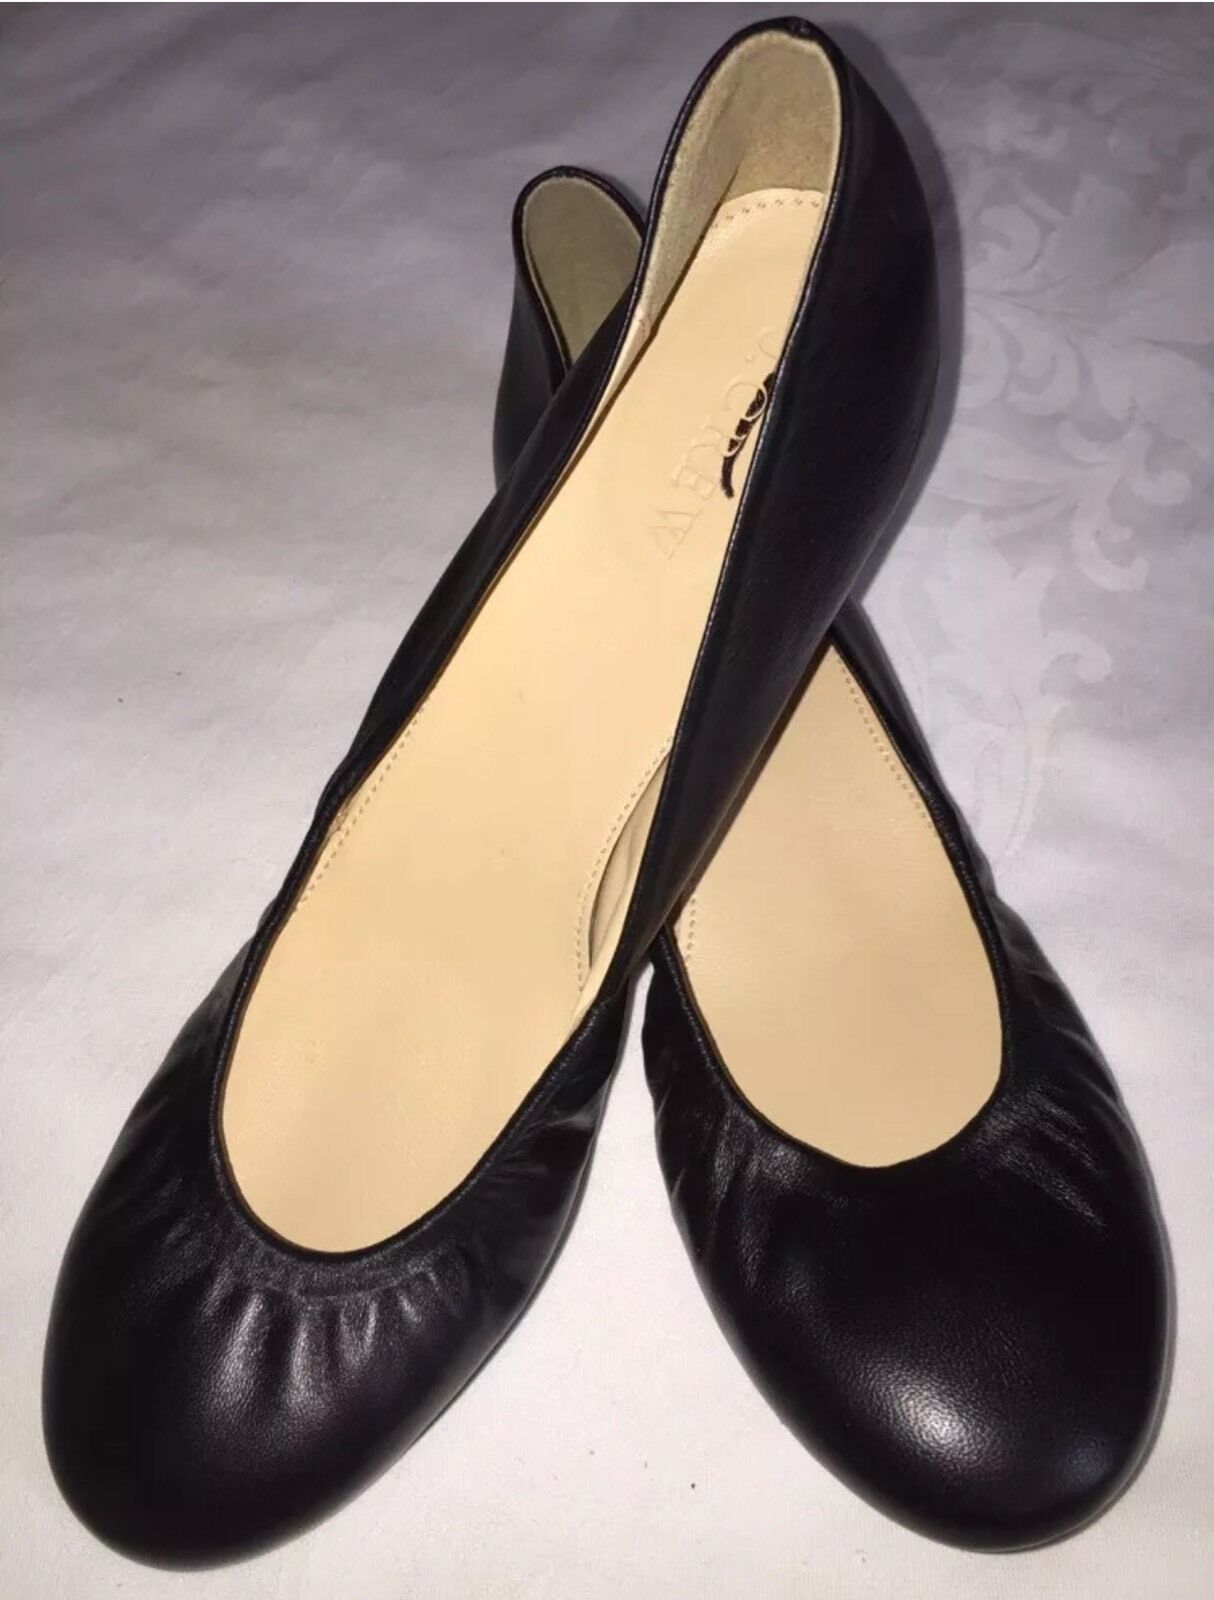 J Crew Cece Ballet Flats Black Leather 64408 NEW 6